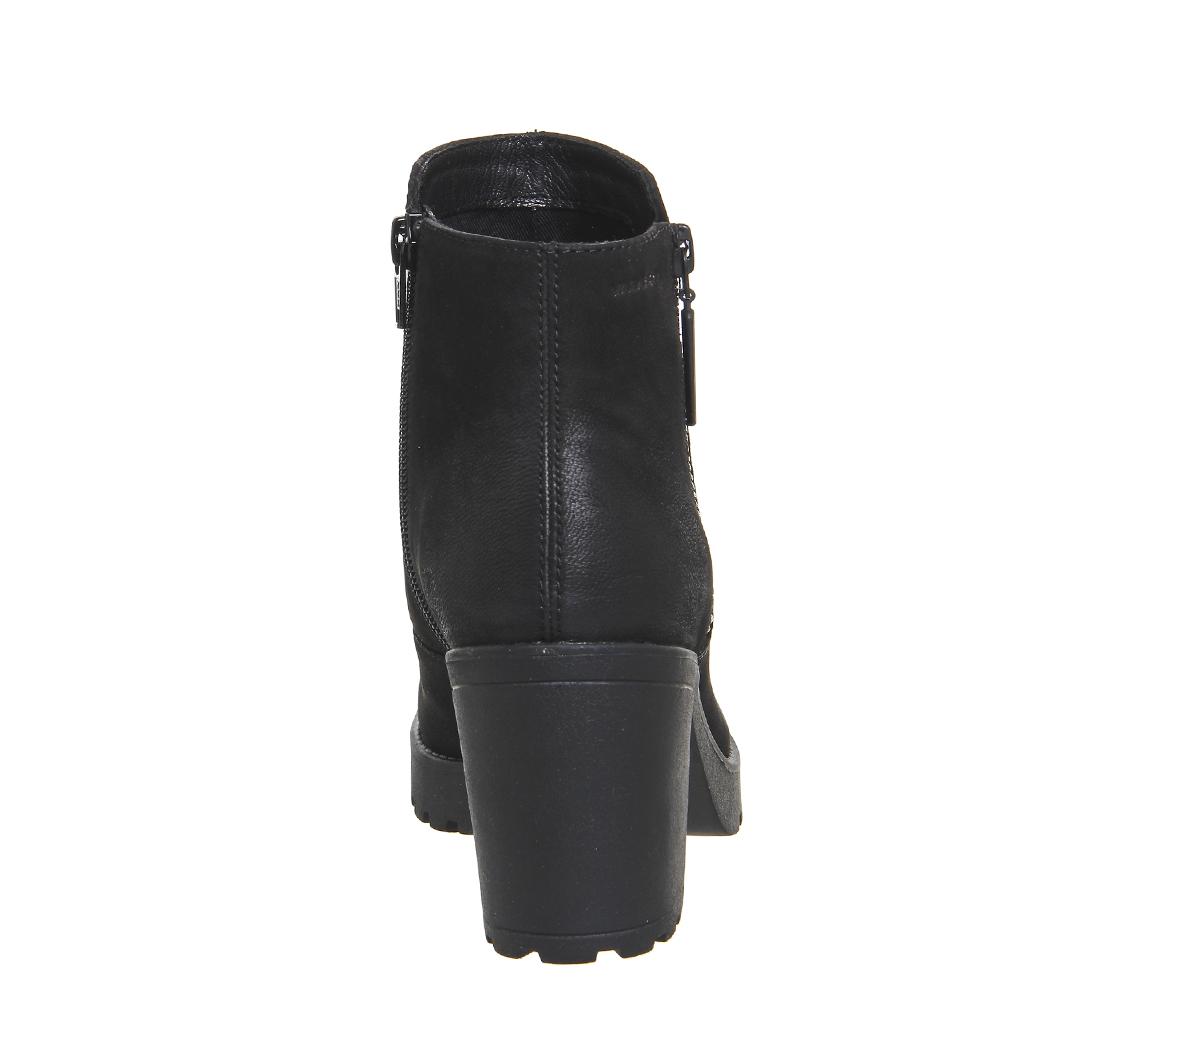 8ef707710f69a1 Womens-Vagabond-Grace-Zip-Boots-Black-Nubuck-Boots thumbnail